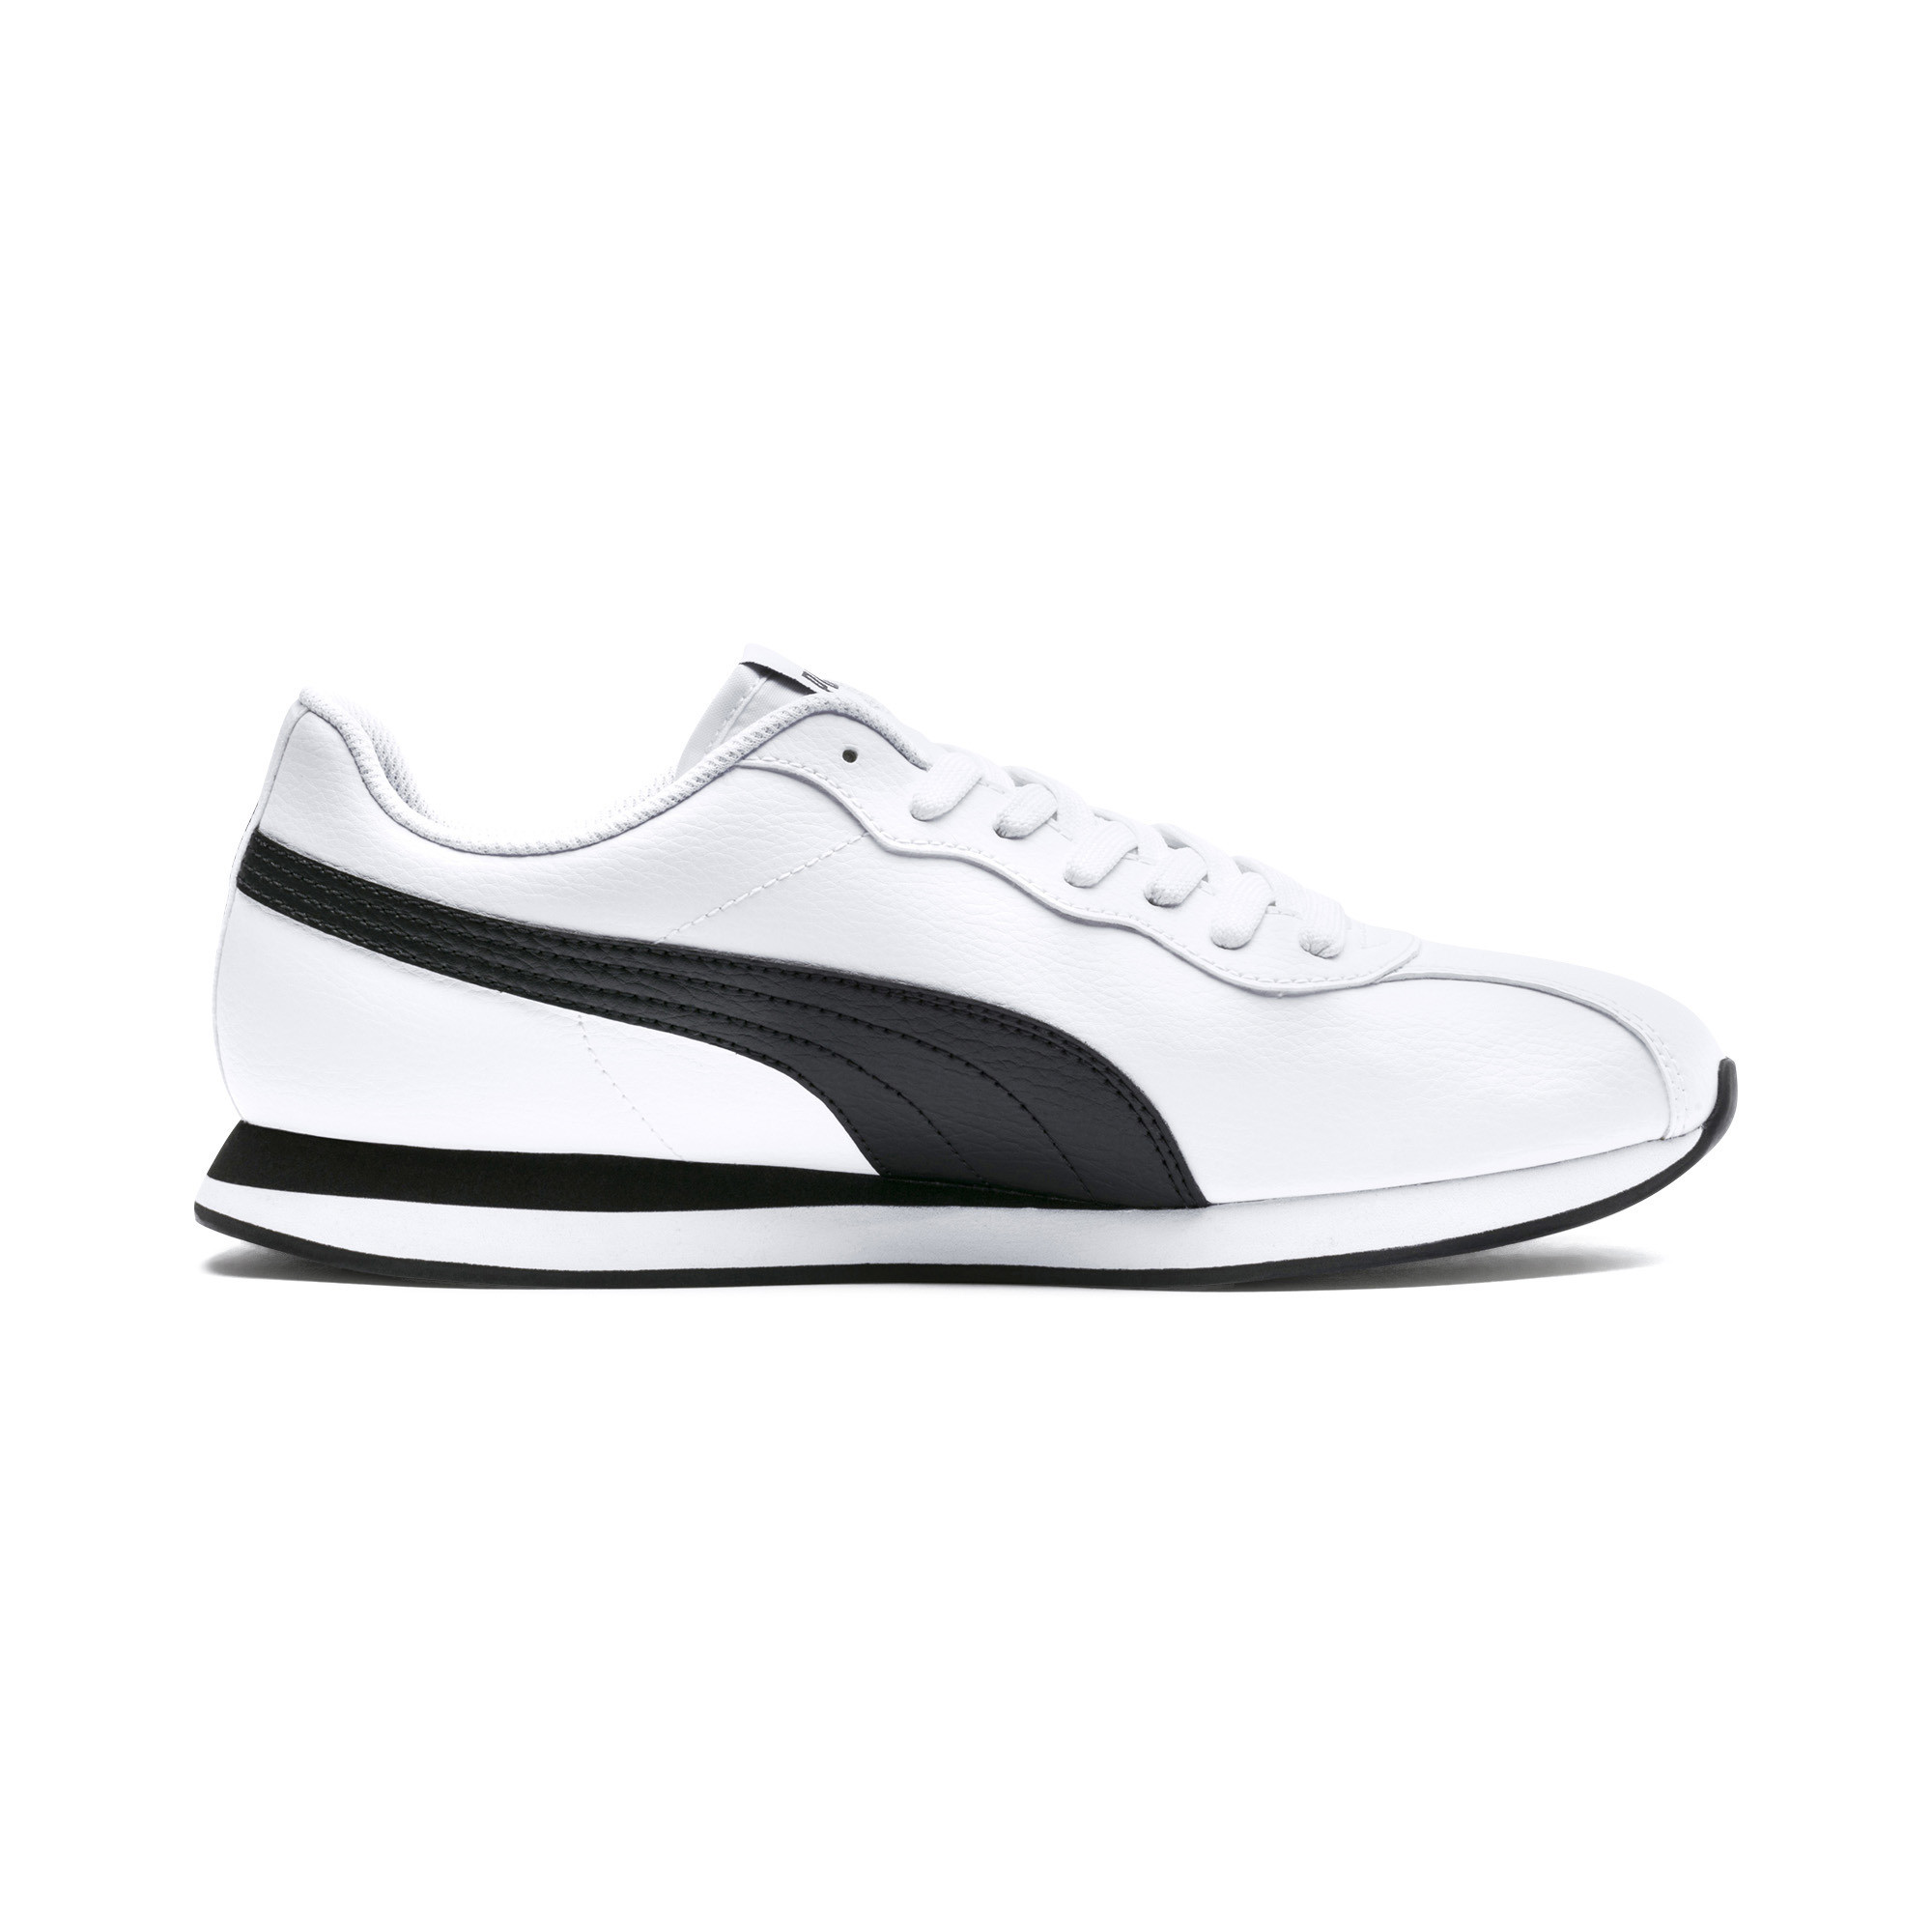 PUMA-Men-039-s-Turin-II-Sneakers thumbnail 18